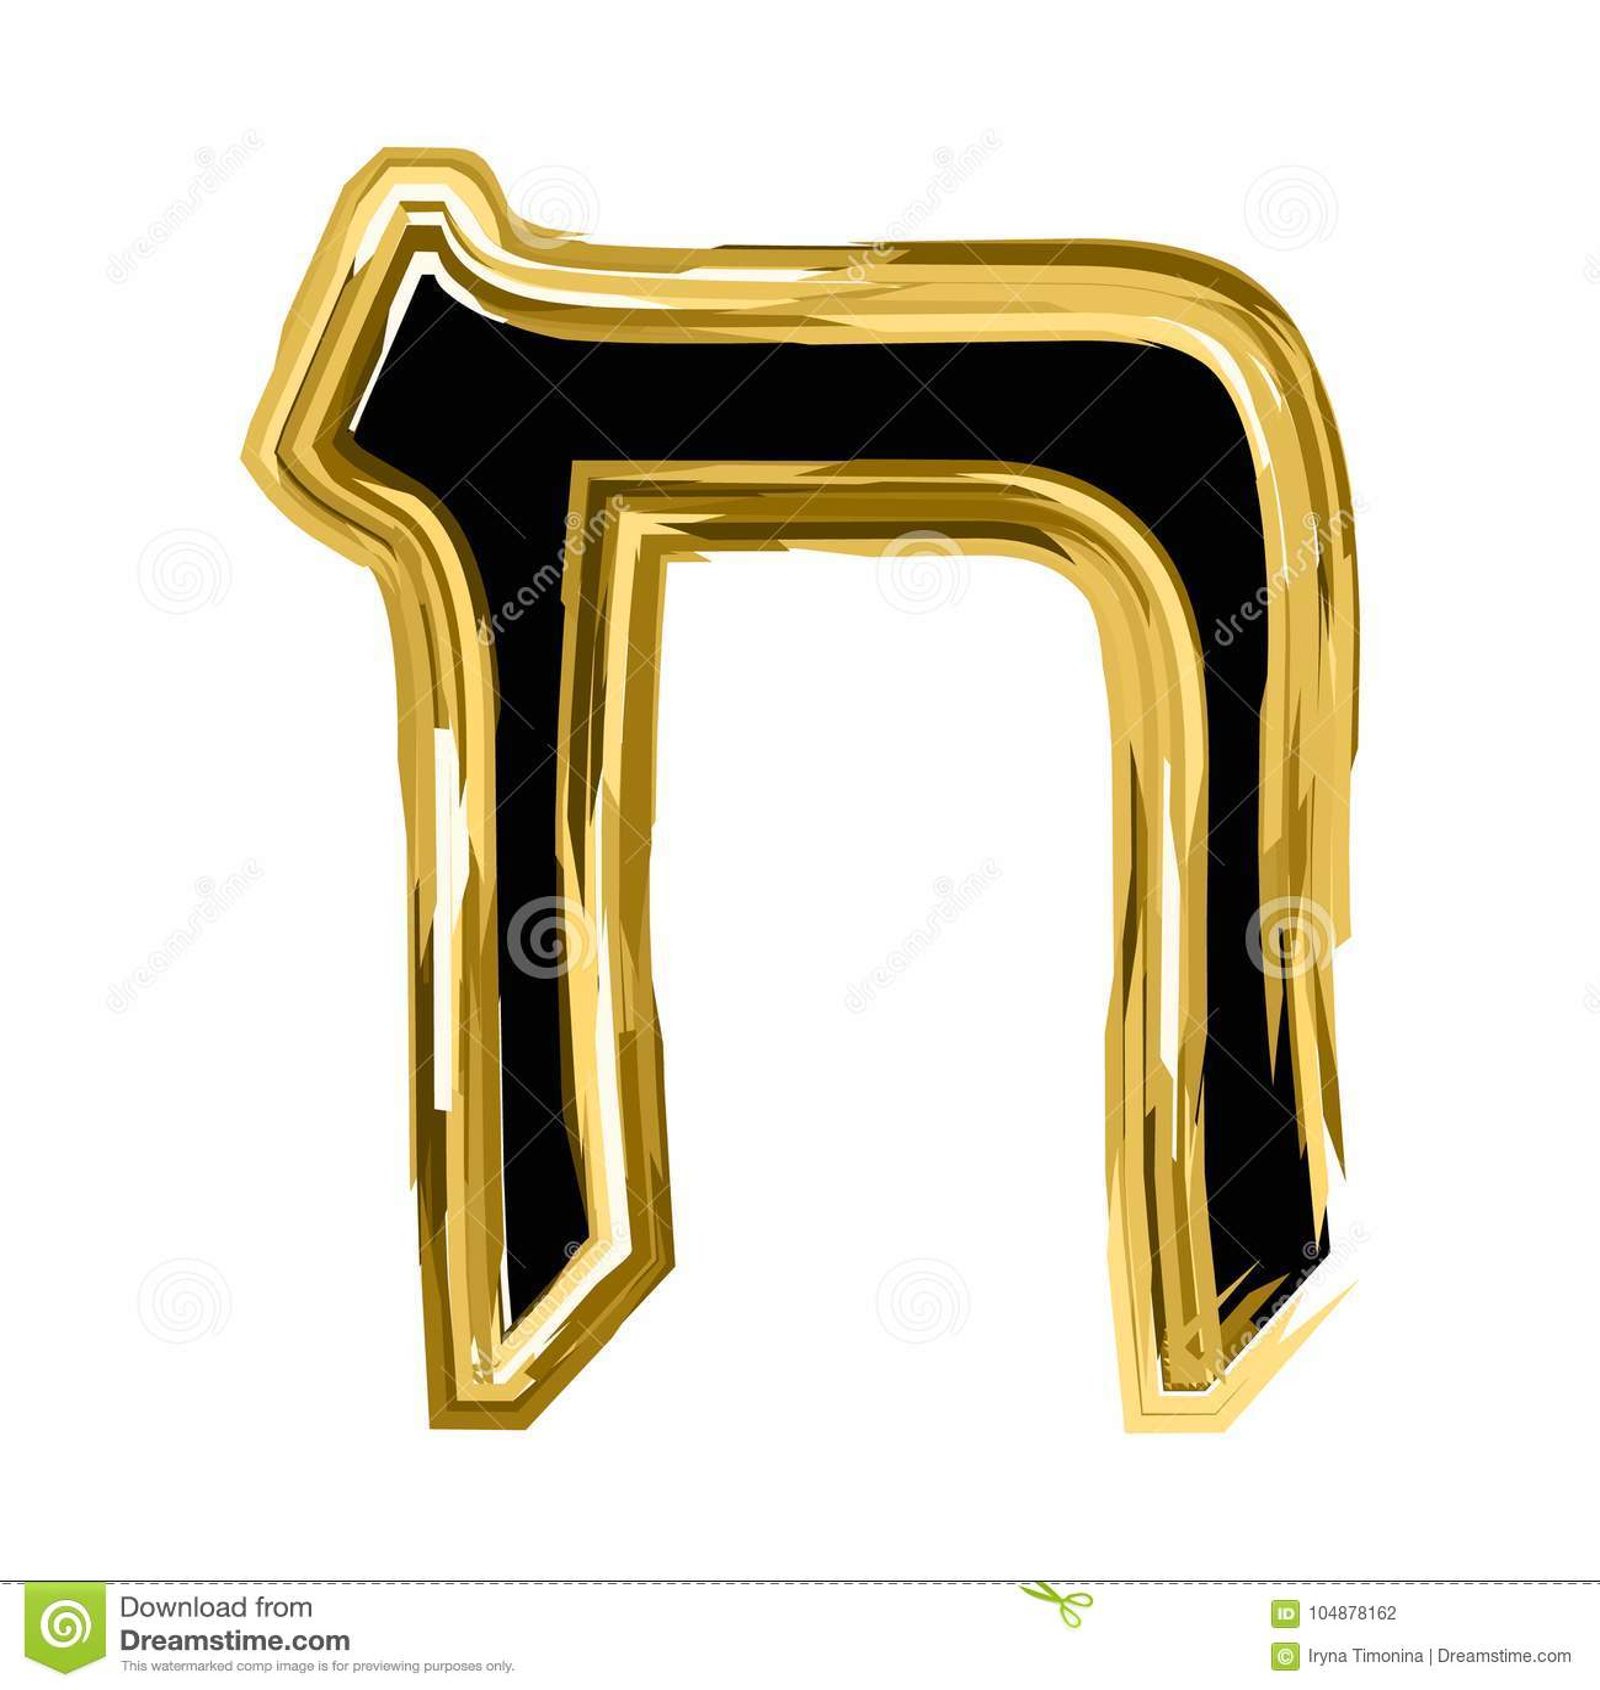 Golden Letter Heth From The Hebrew Alphabet  Gold Letter Font Hanukkah  Vector Illustration On